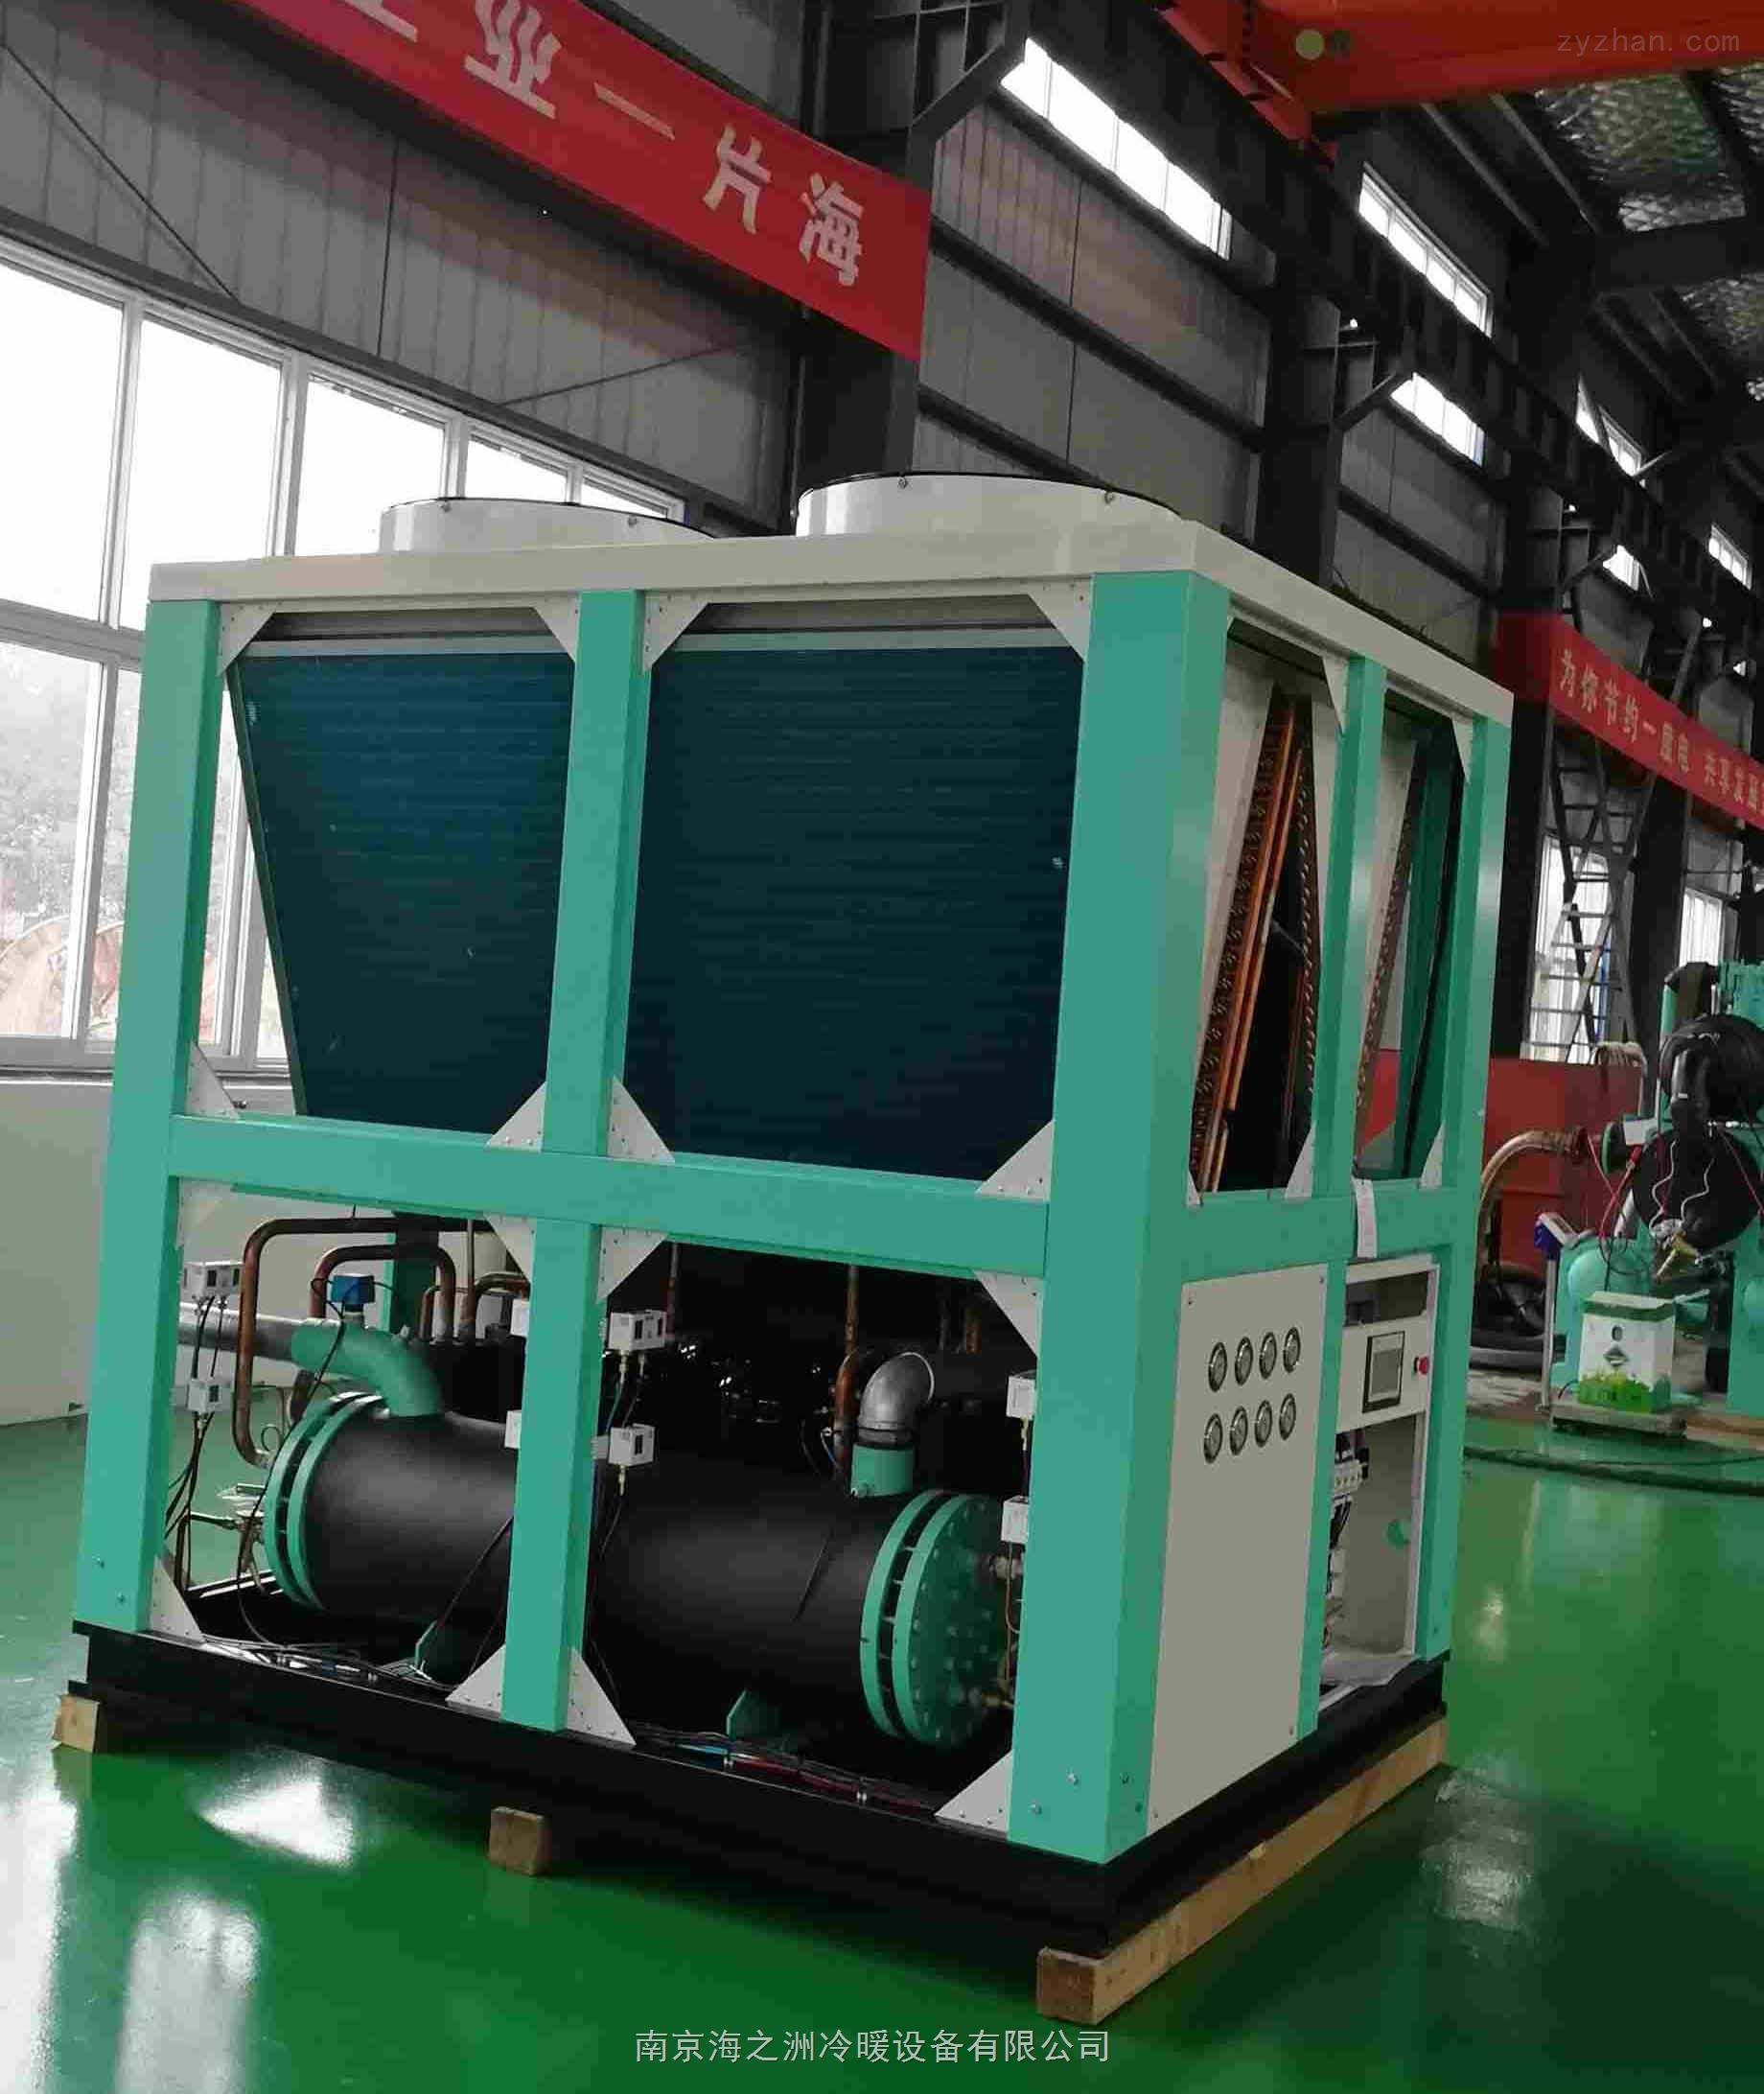 HZS-480AD型螺杆式风冷冷水机